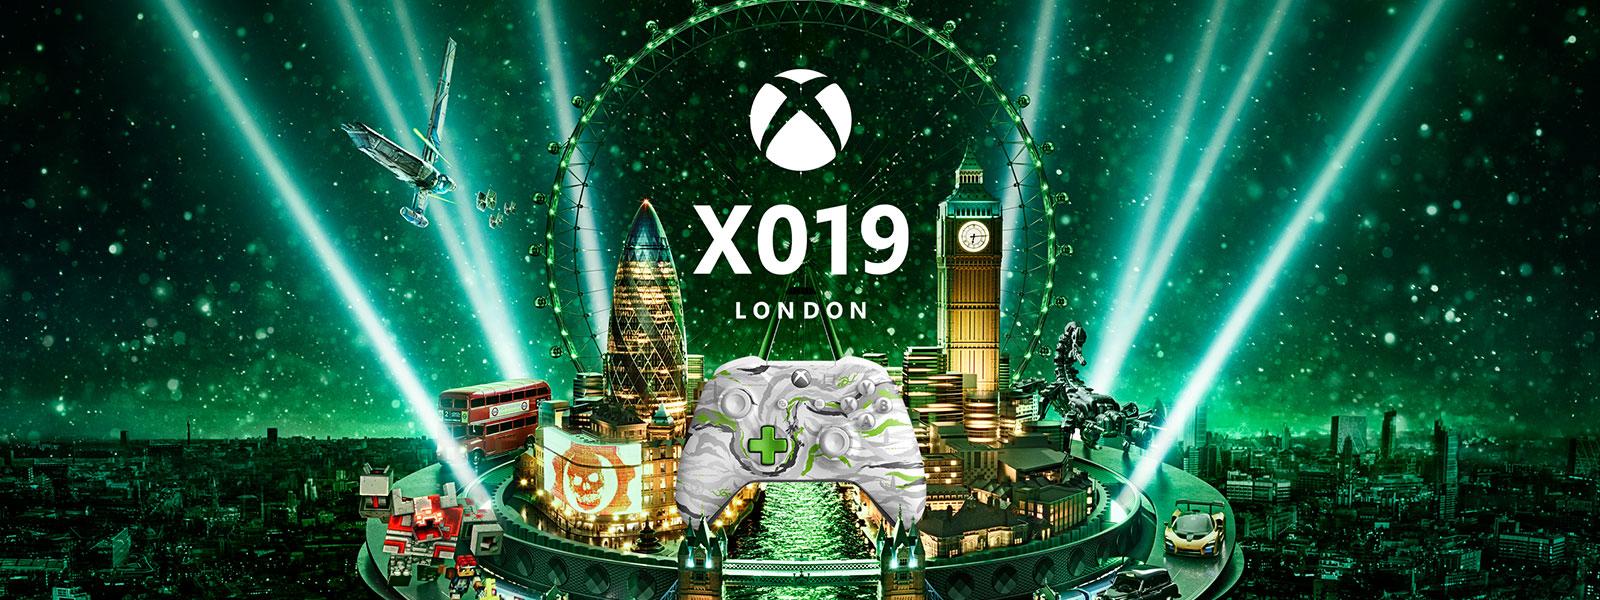 X019 logo, the london skyline lit up in xbox green